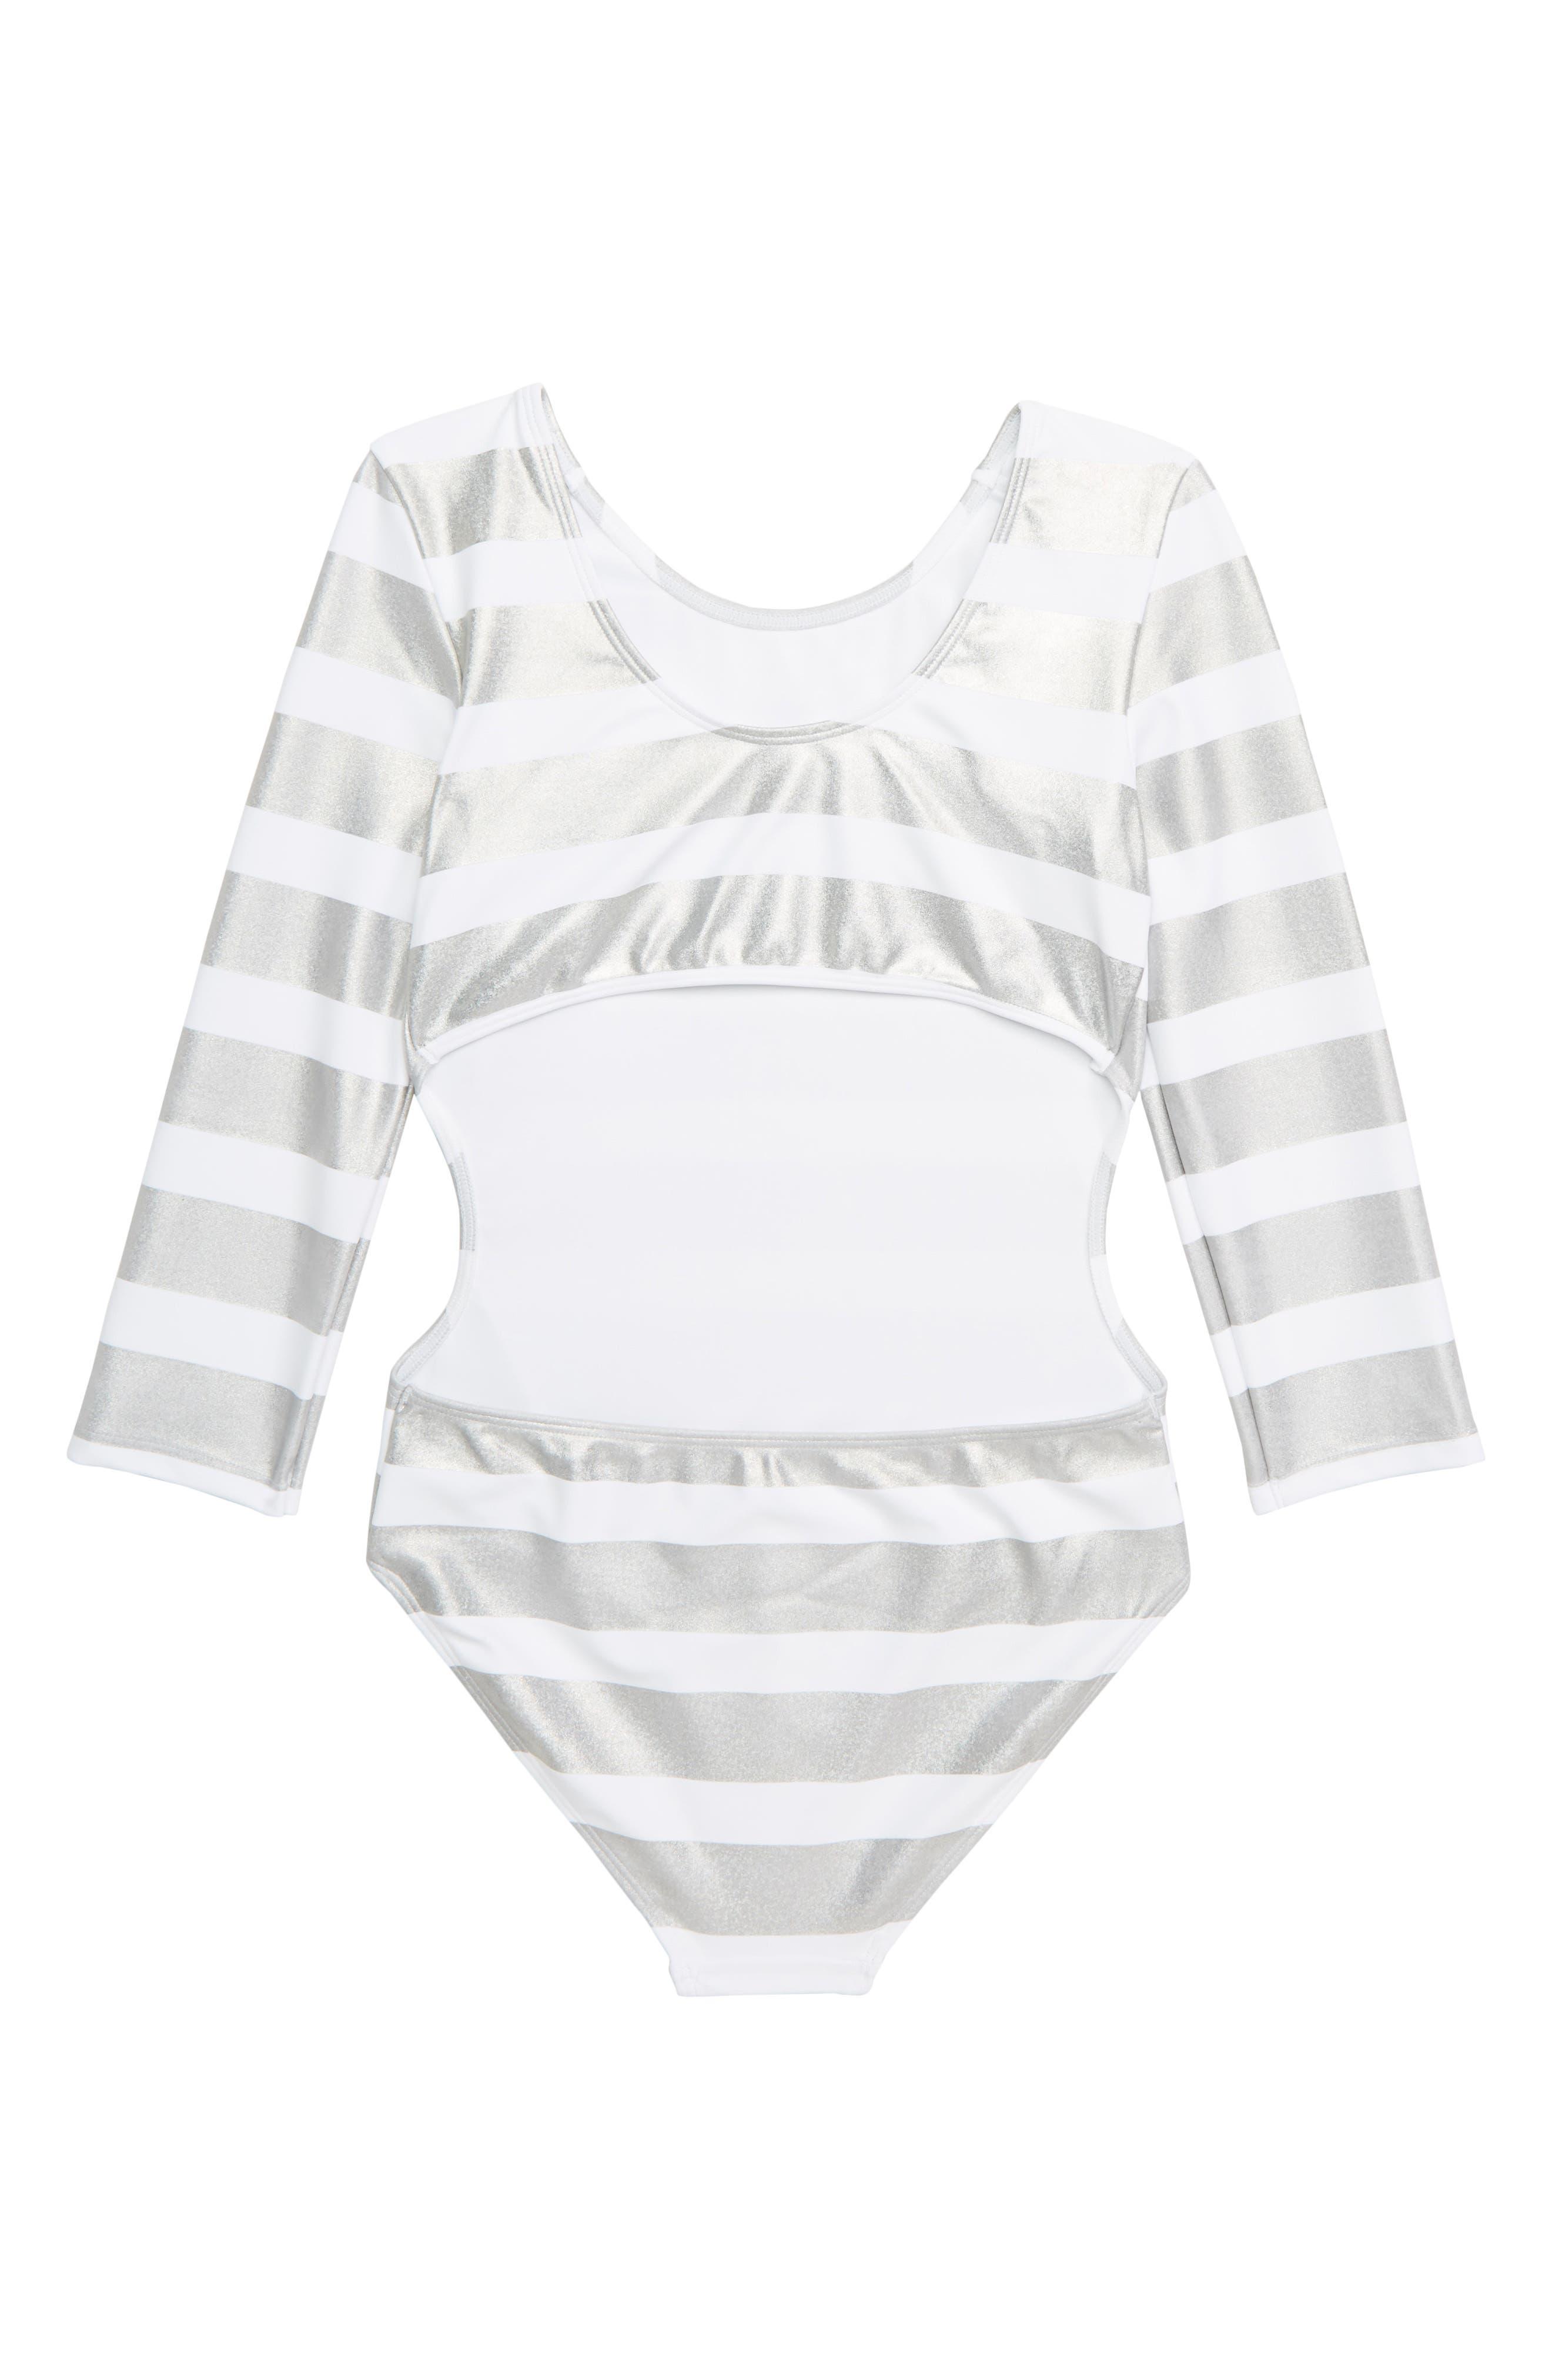 ZELLA GIRL,                             Mirror Stripe One-Piece Swimsuit,                             Alternate thumbnail 2, color,                             WHITE MULTI FOIL STRIPE